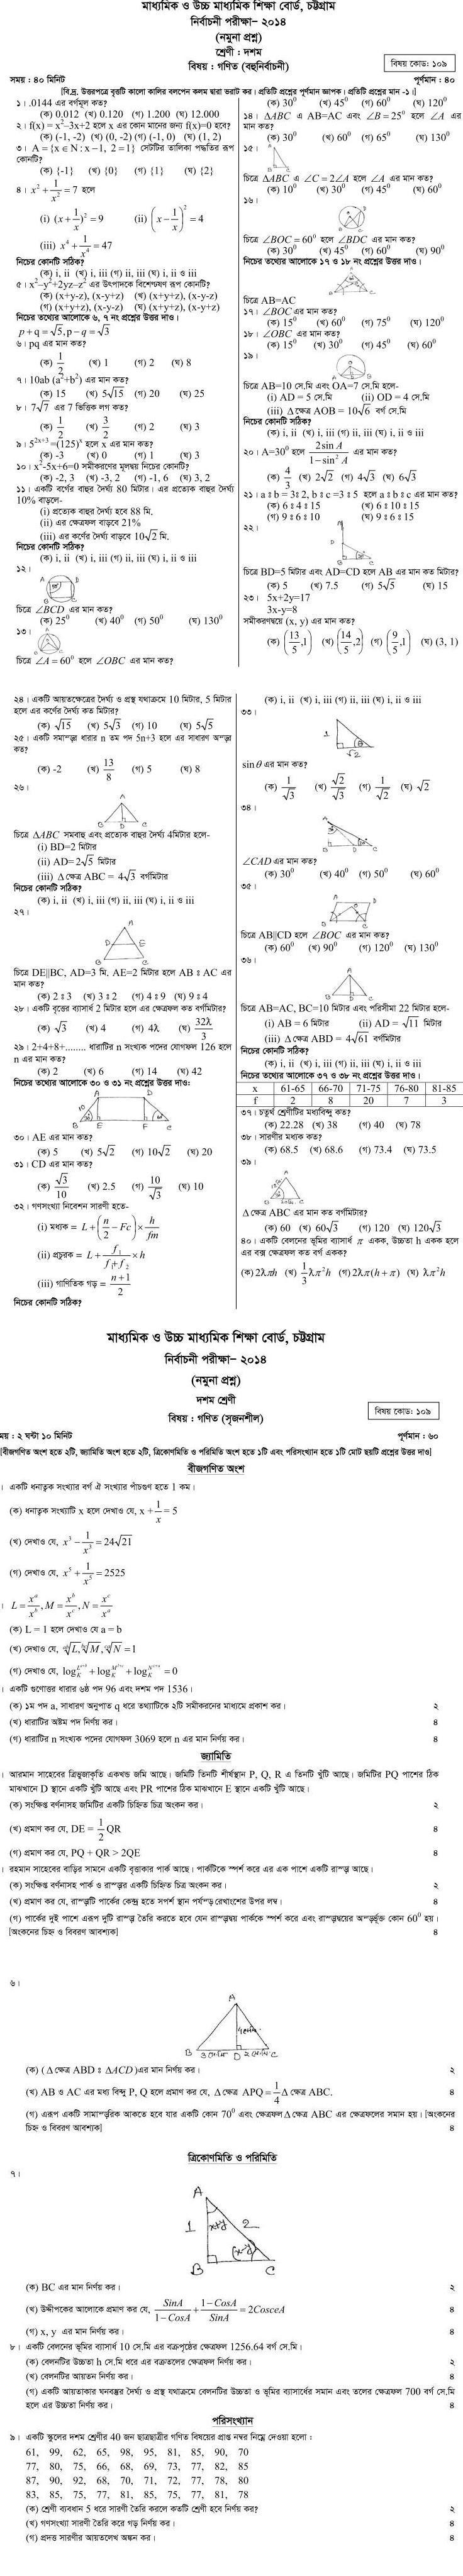 SSC Math syllabus 2016 Sample Question Math Suggestion